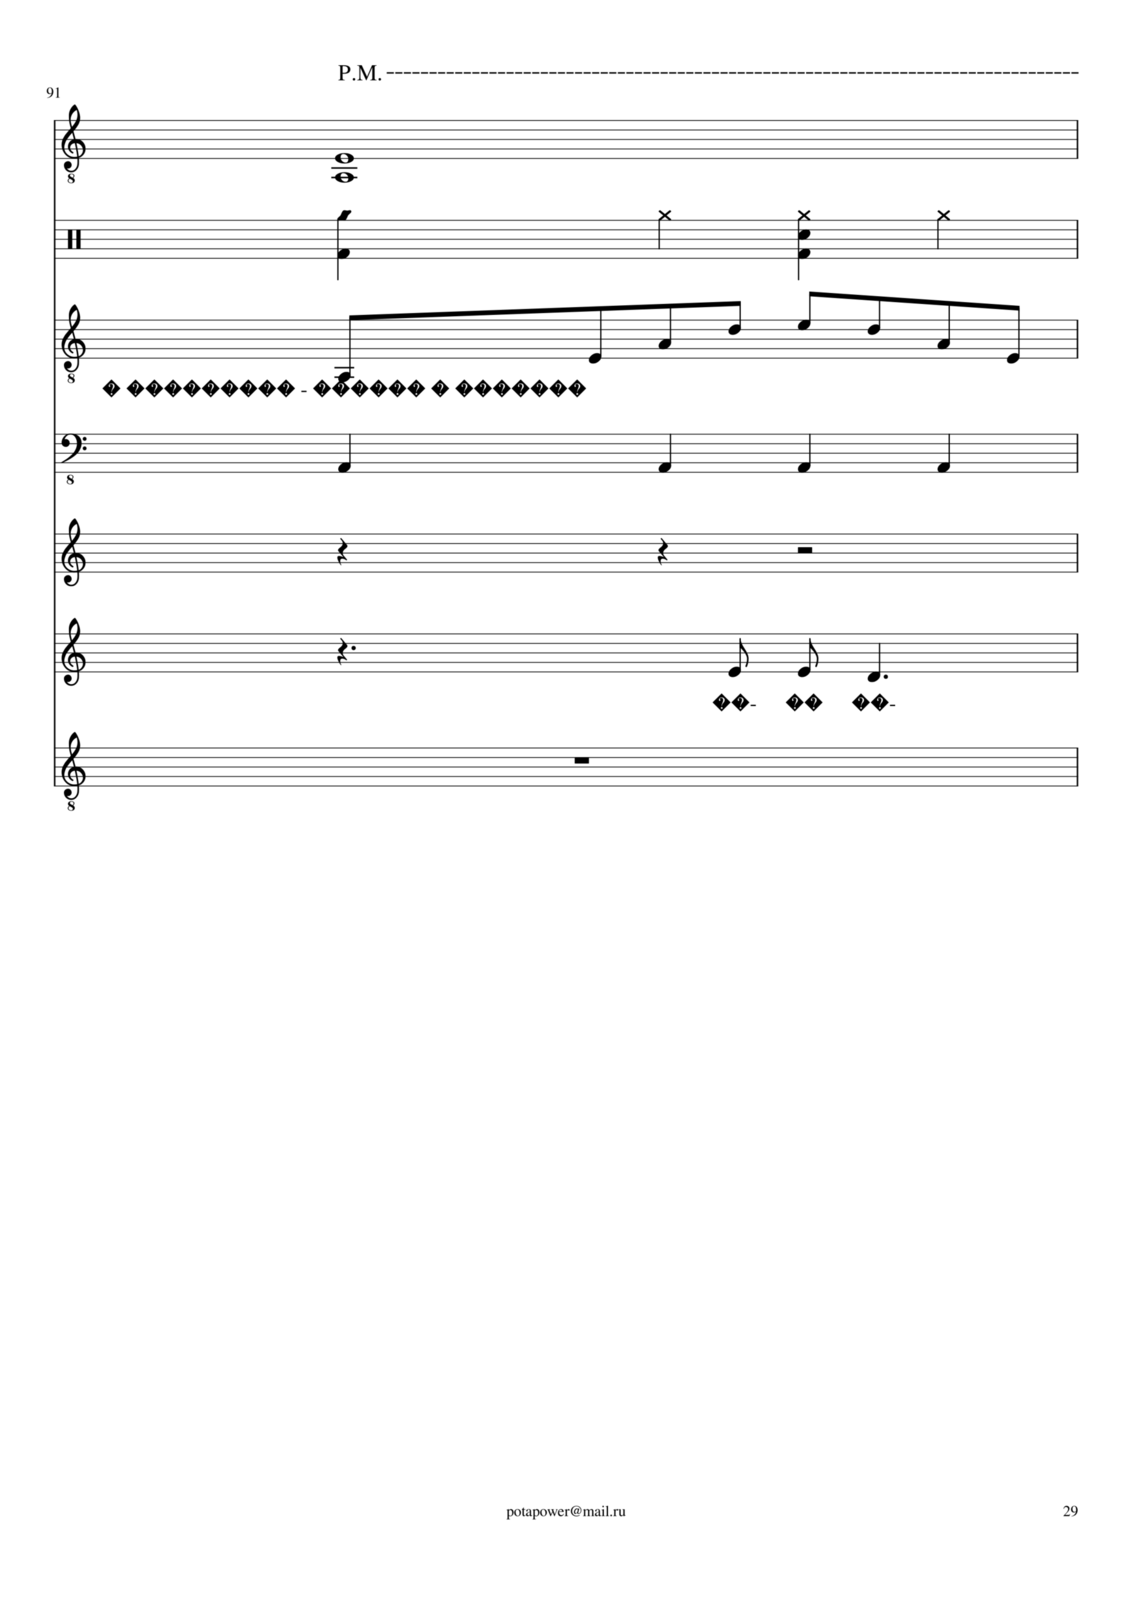 Ten lyubvi slide, Image 29